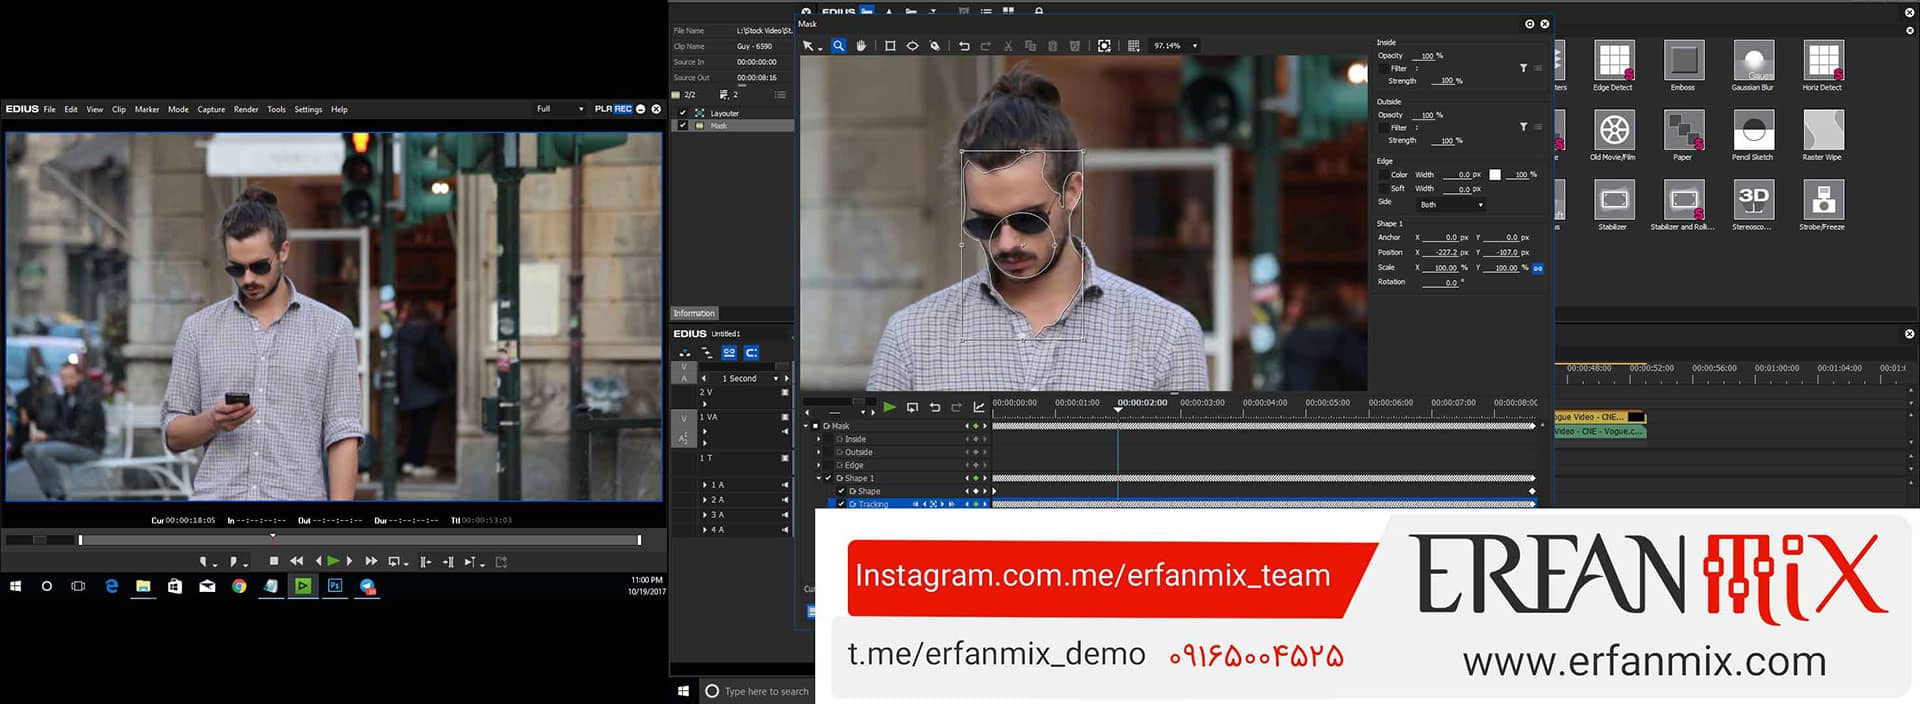 جدیدترین نسخه لایسنس ادیوس 8.53 کاملا آفلاین 2021